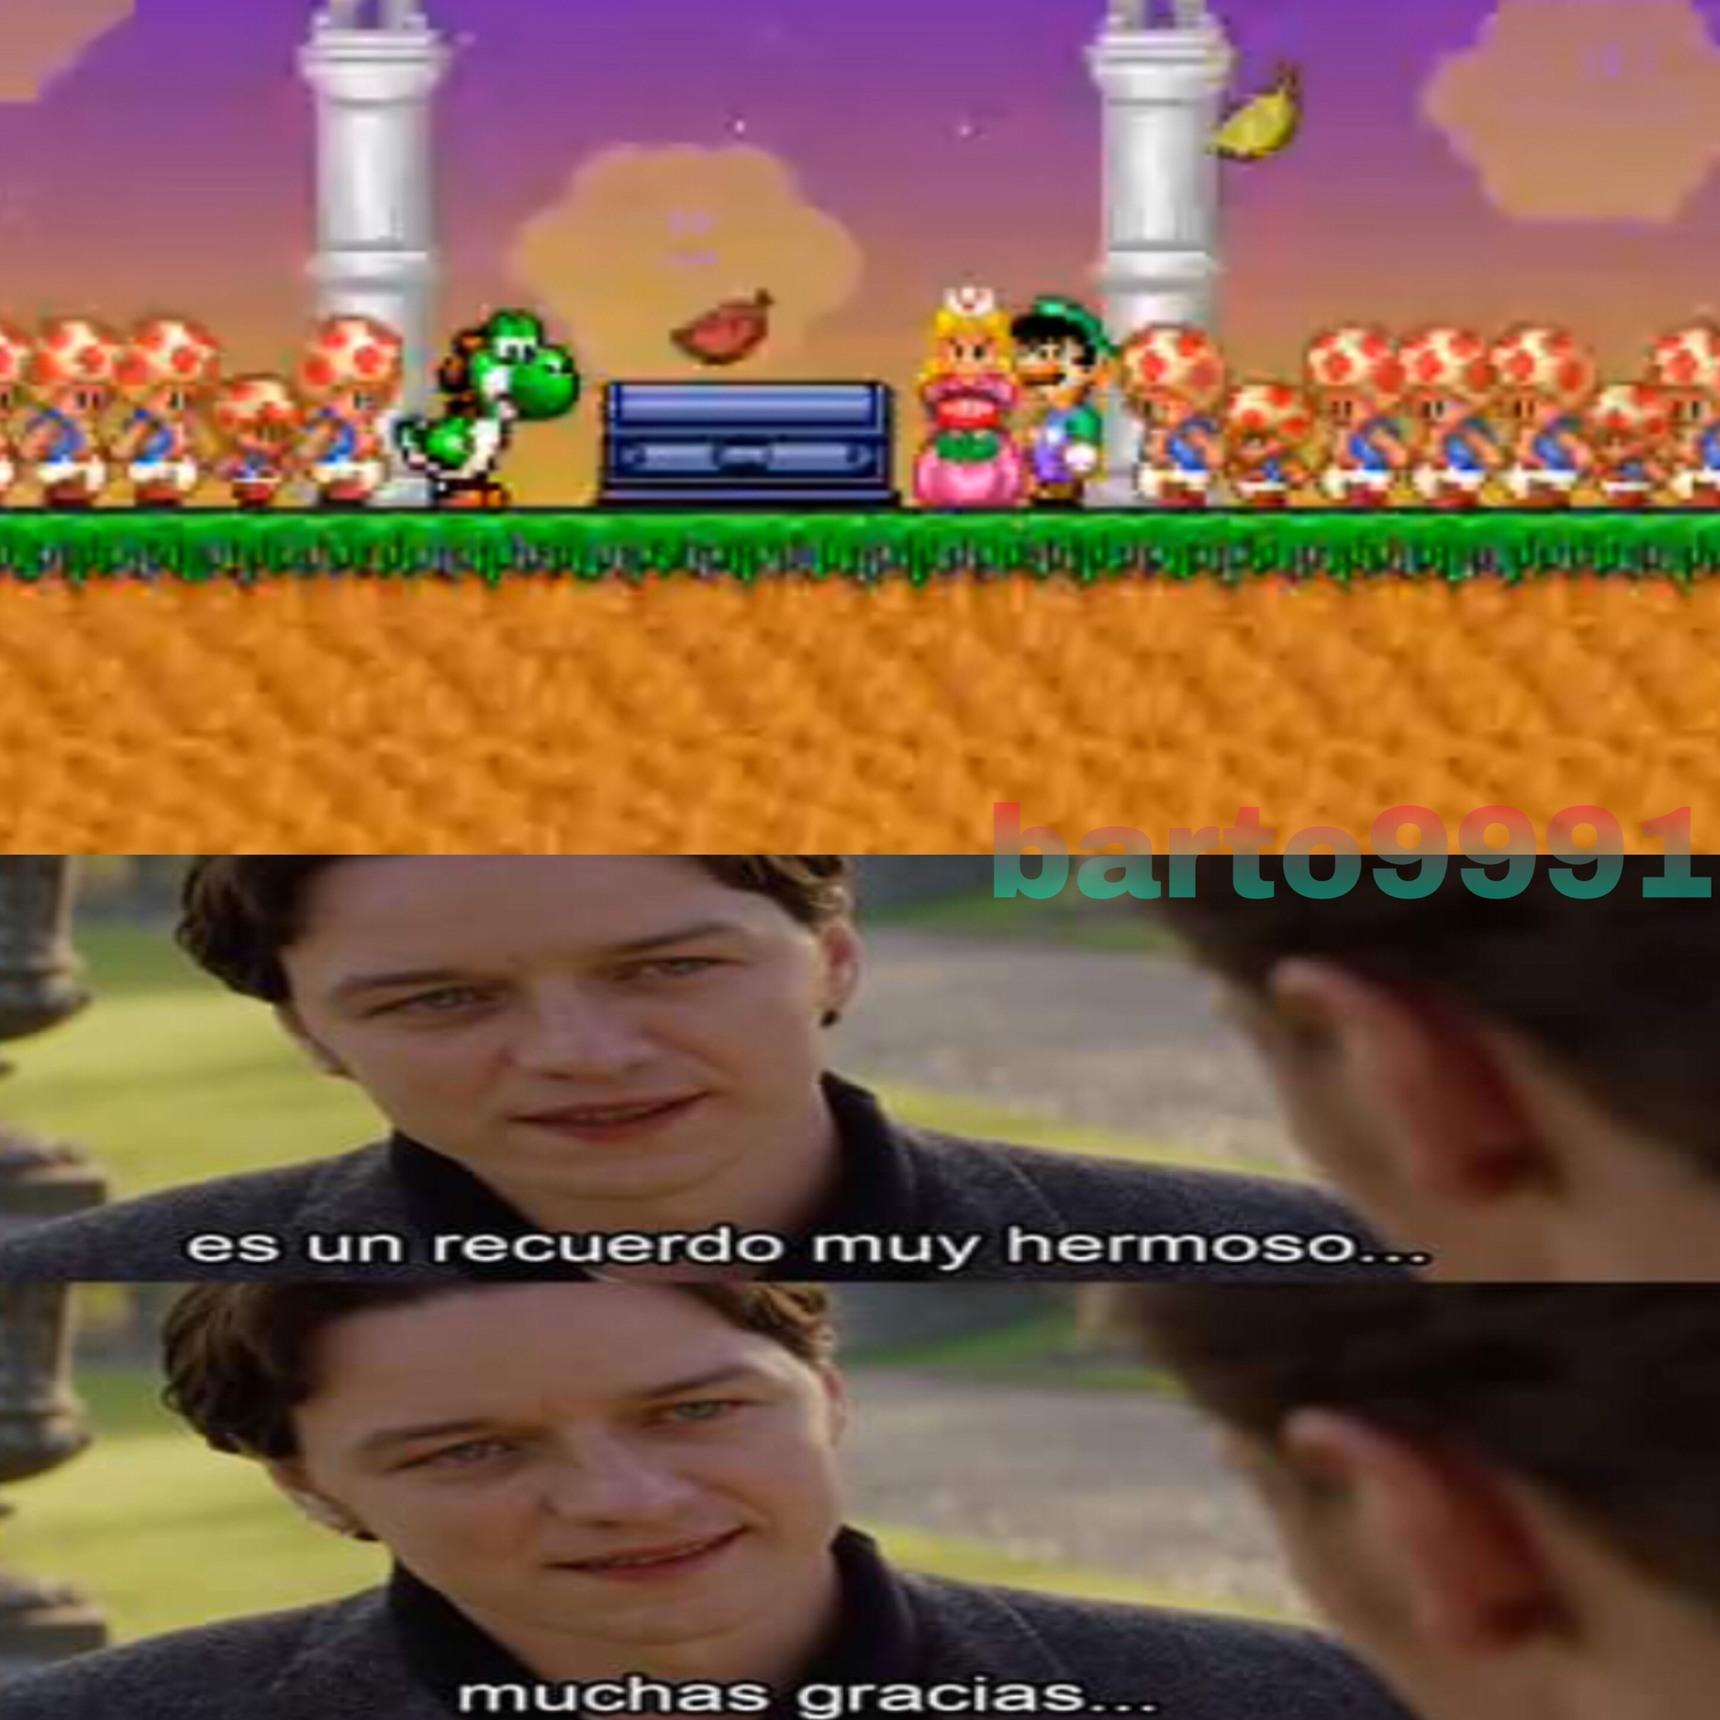 Uffff la nostalgia - meme